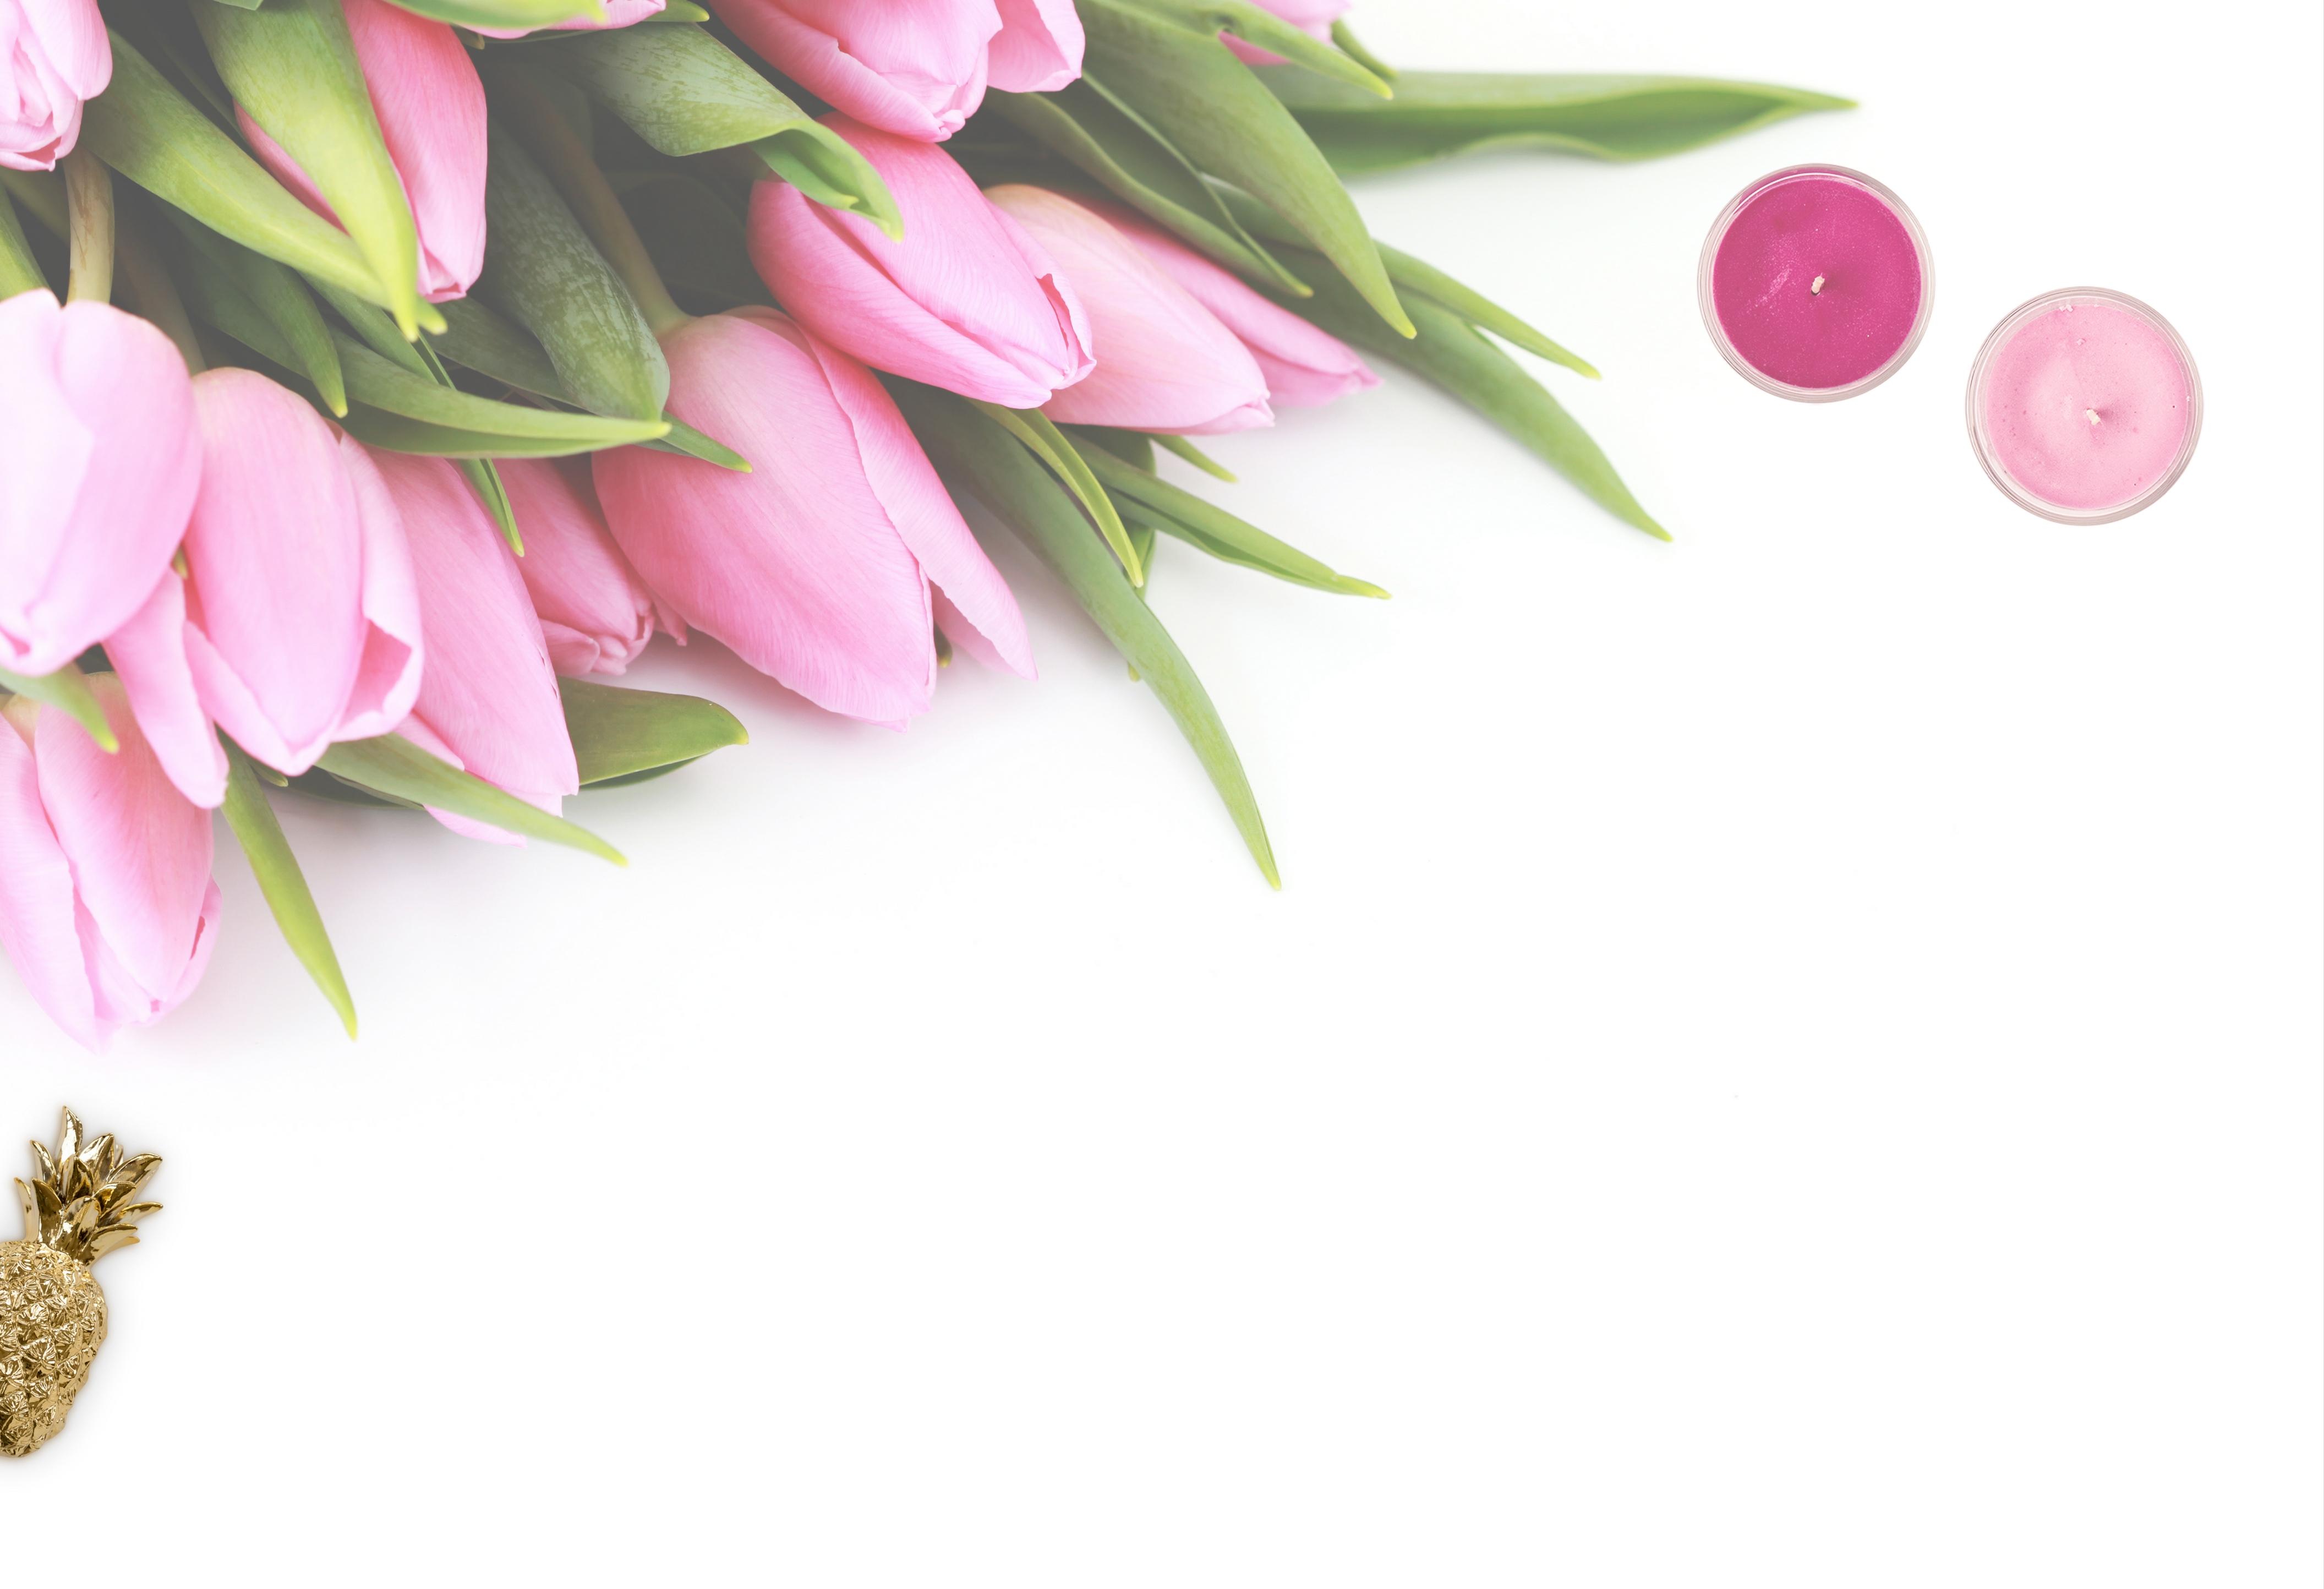 Peonies Wallpaper Iphone 6 250 Interesting Flatlay Photos 183 Pexels 183 Free Stock Photos